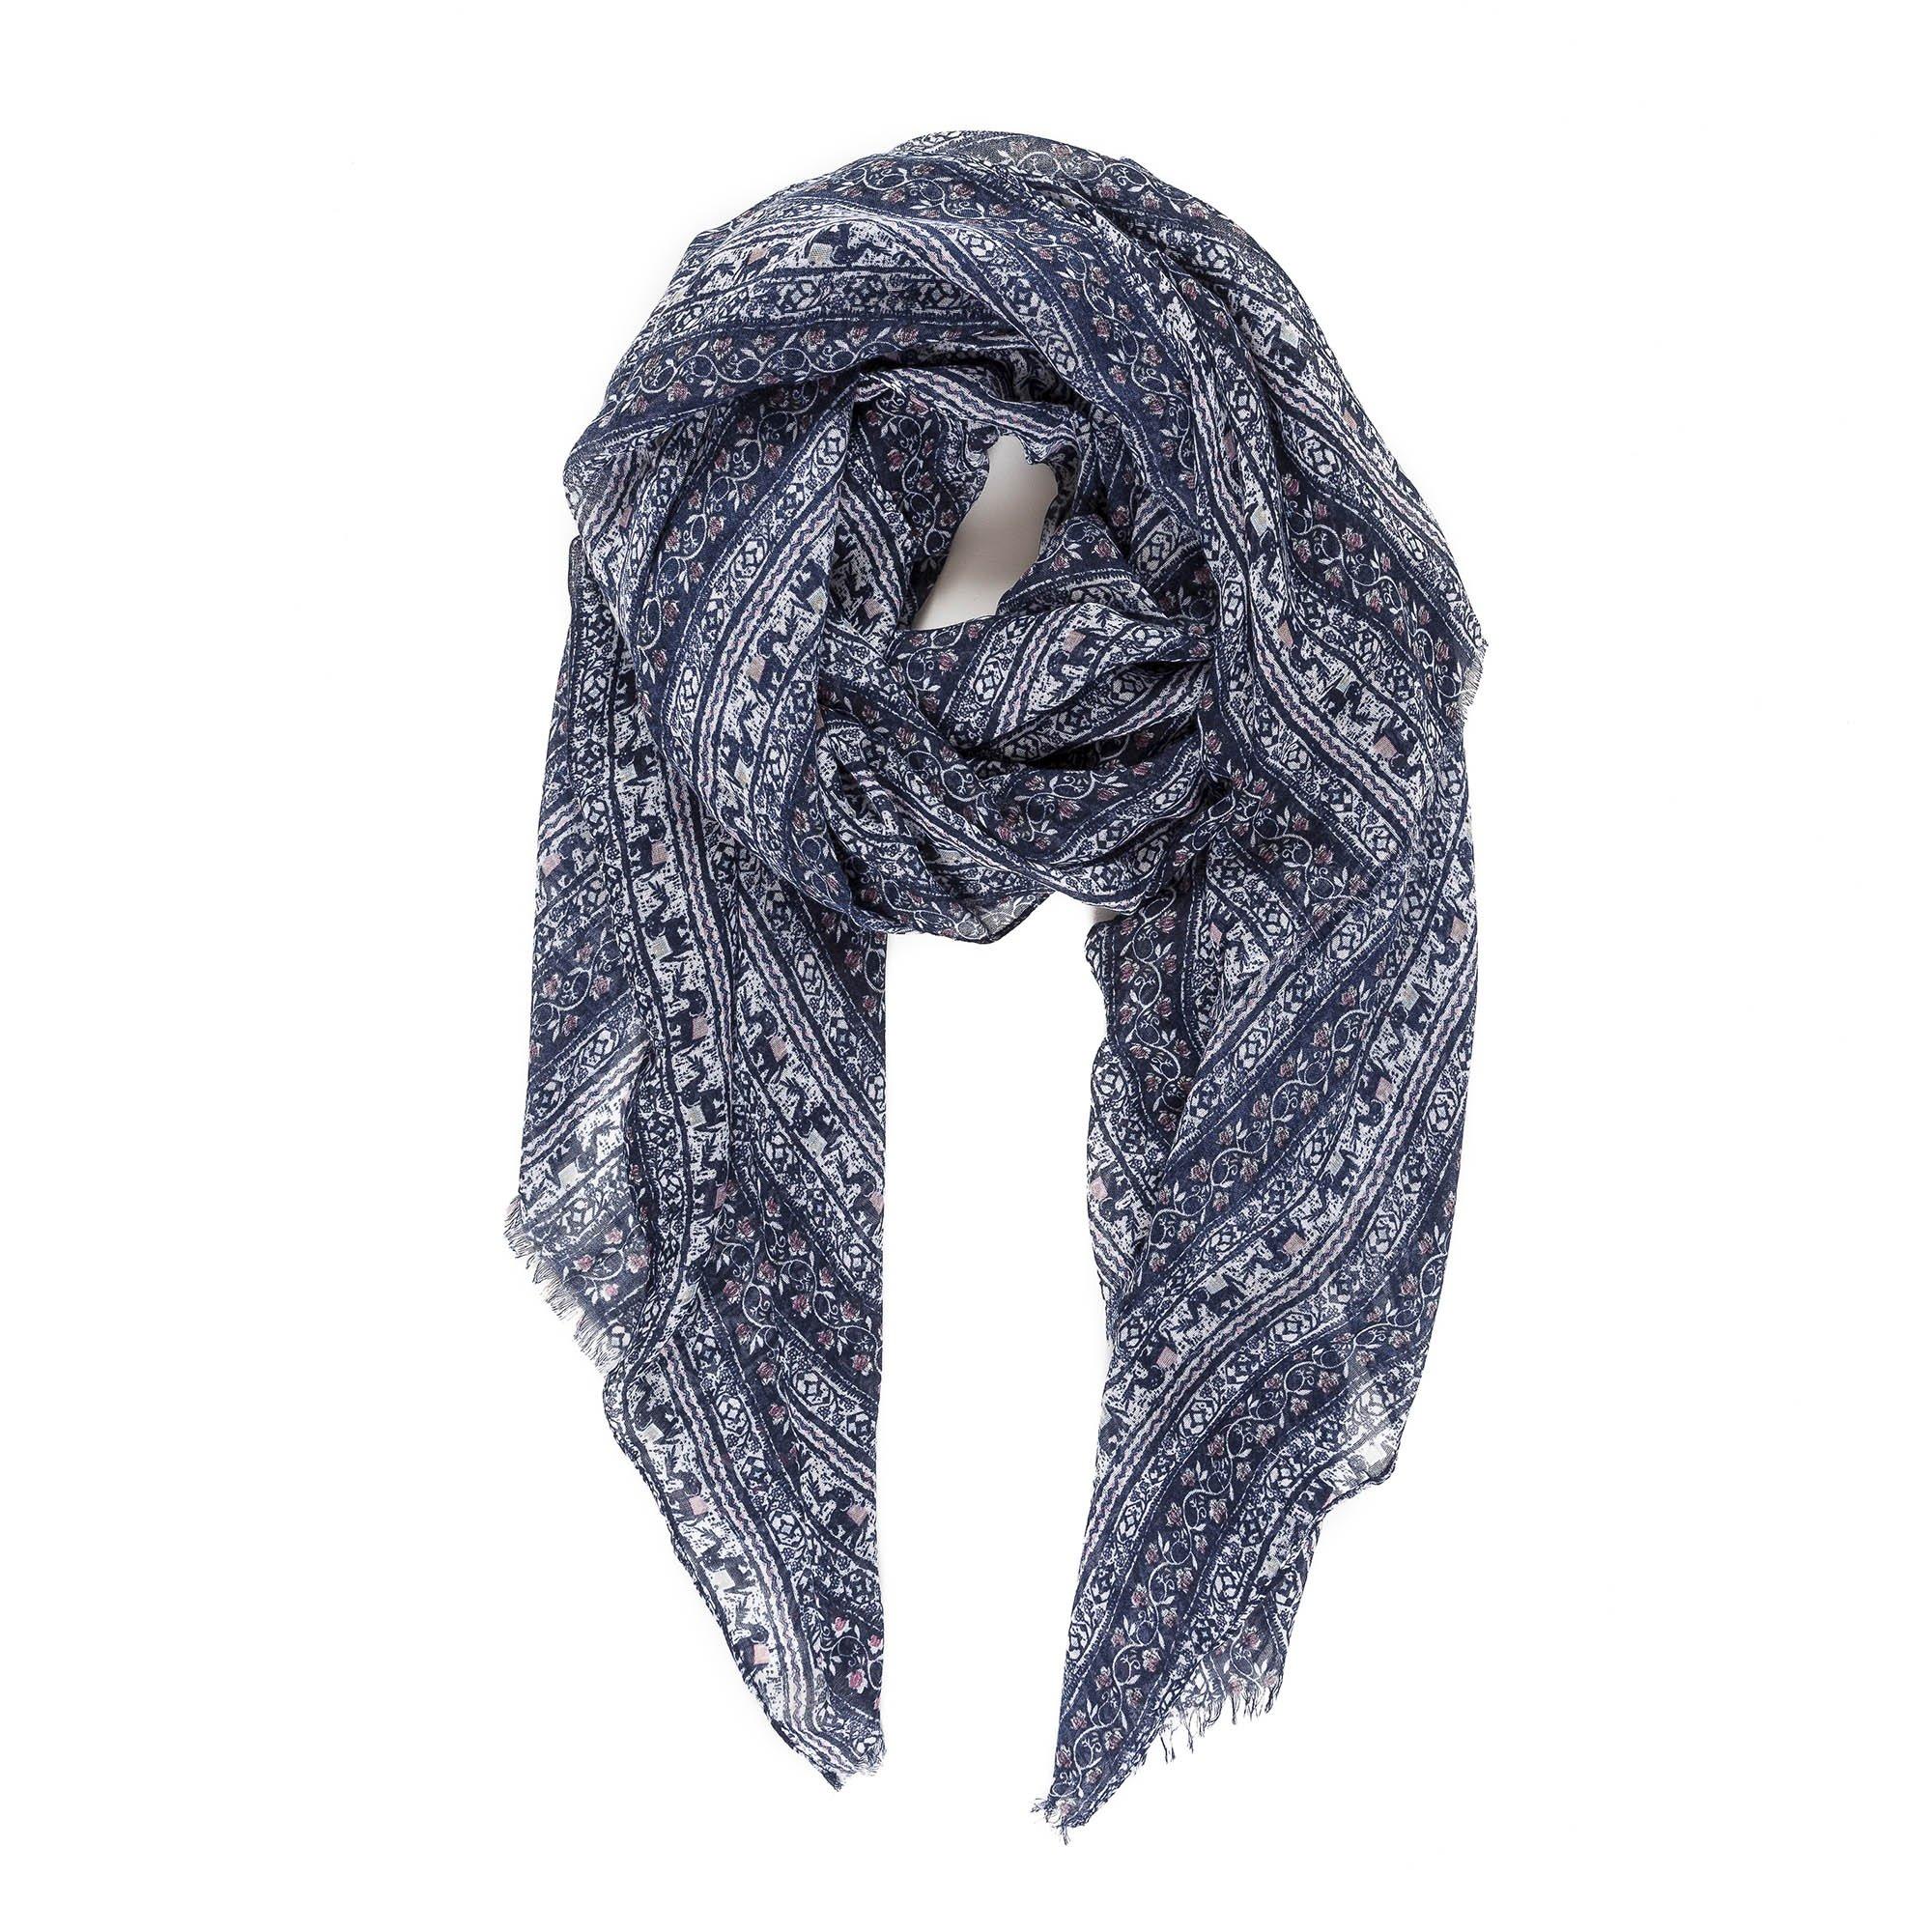 Scarf for Women Lightweight Animal Elephant Fashion Fall Winter Scarves Shawl Wraps (VF04-2)